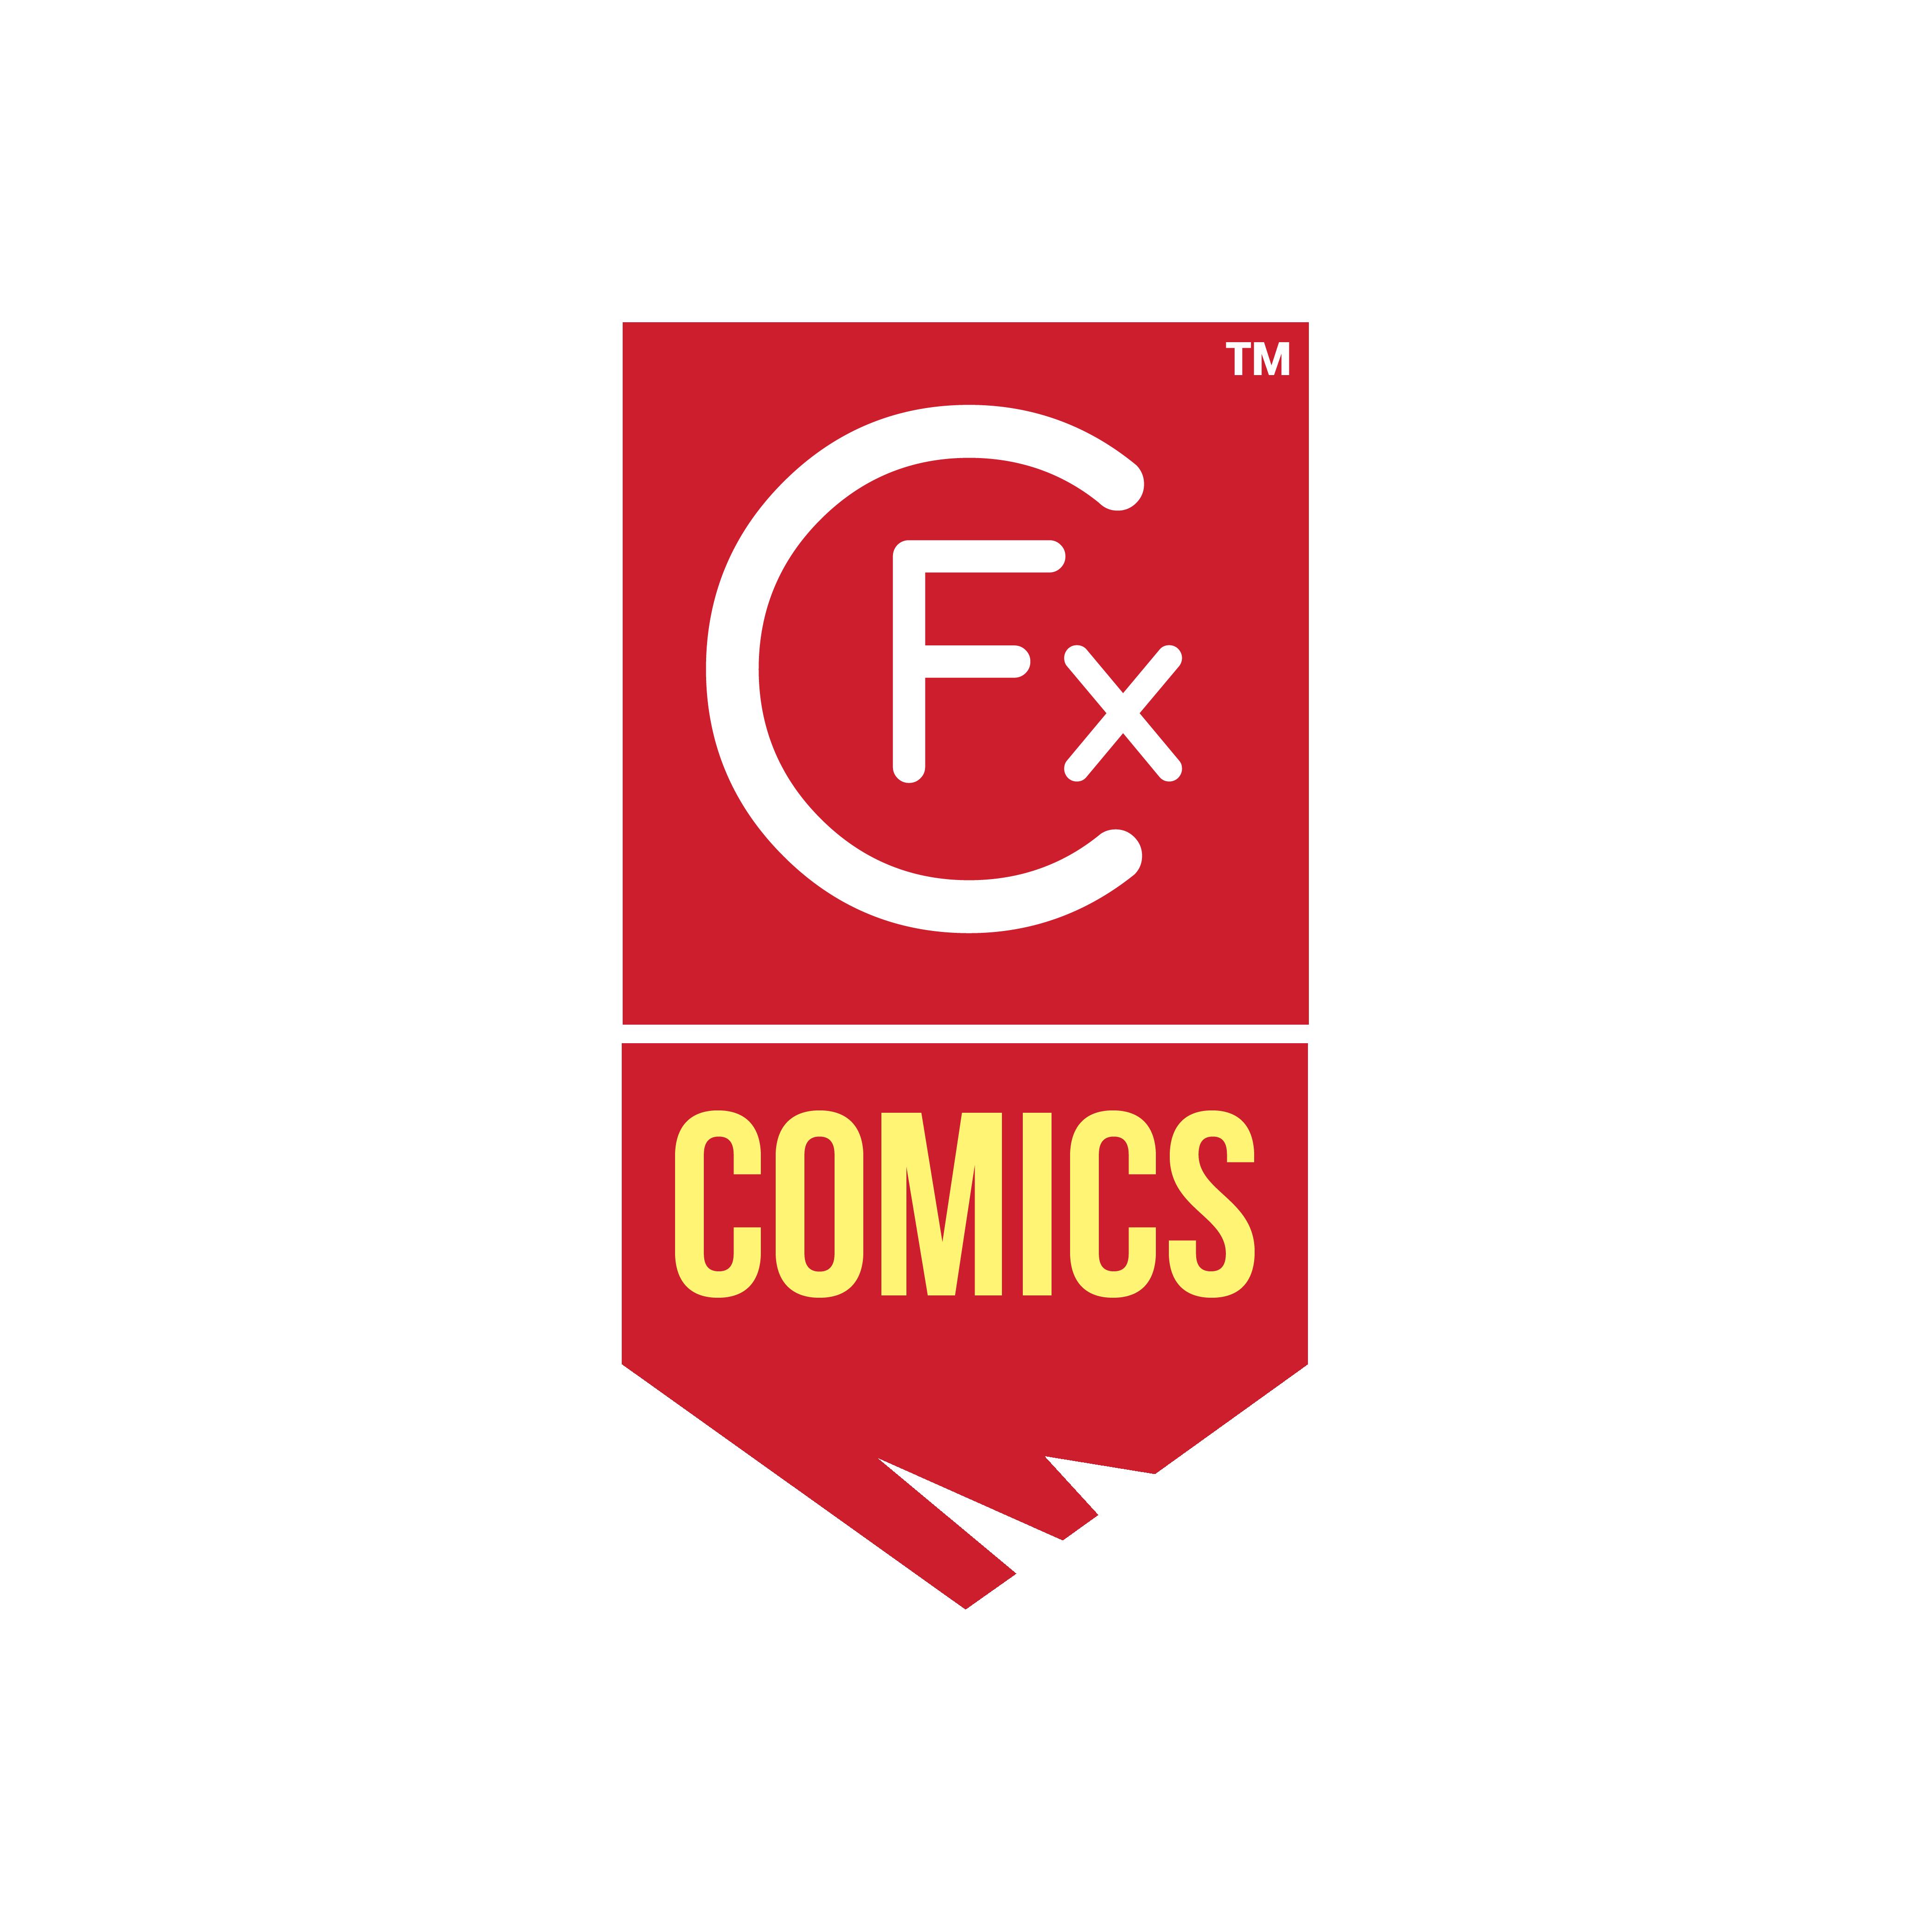 cfx valiant comics bringing international content to pakistan